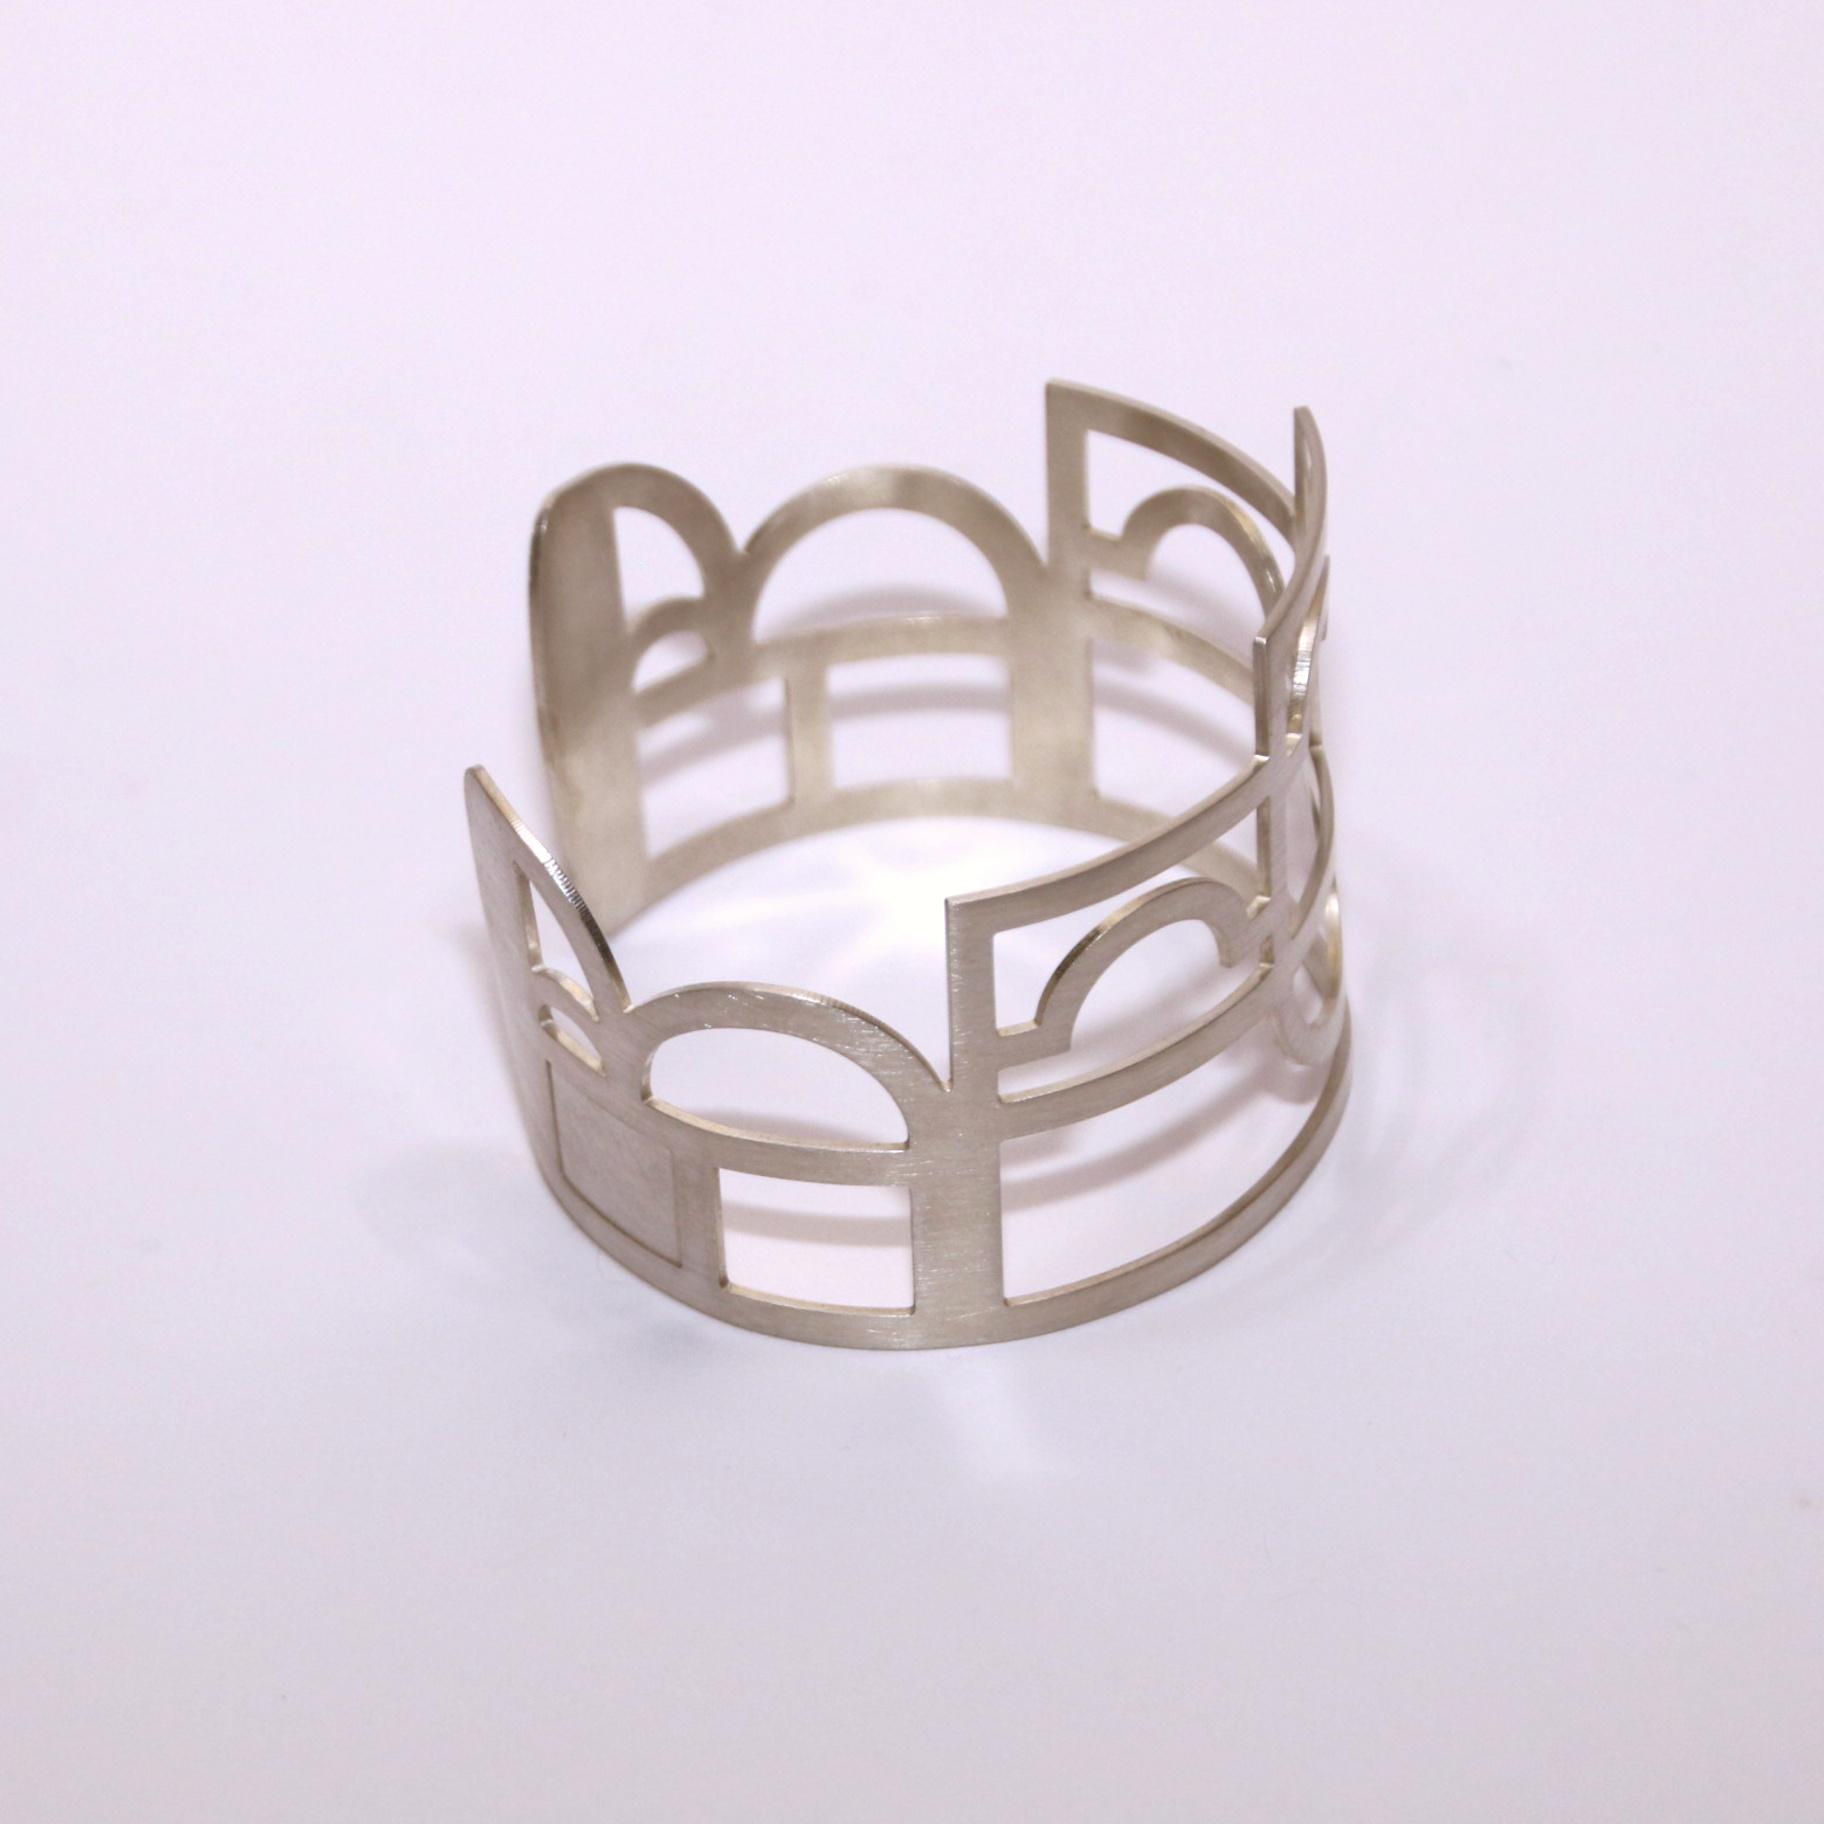 Leen Paelman Armband Gentse contouren - Leen Paelman